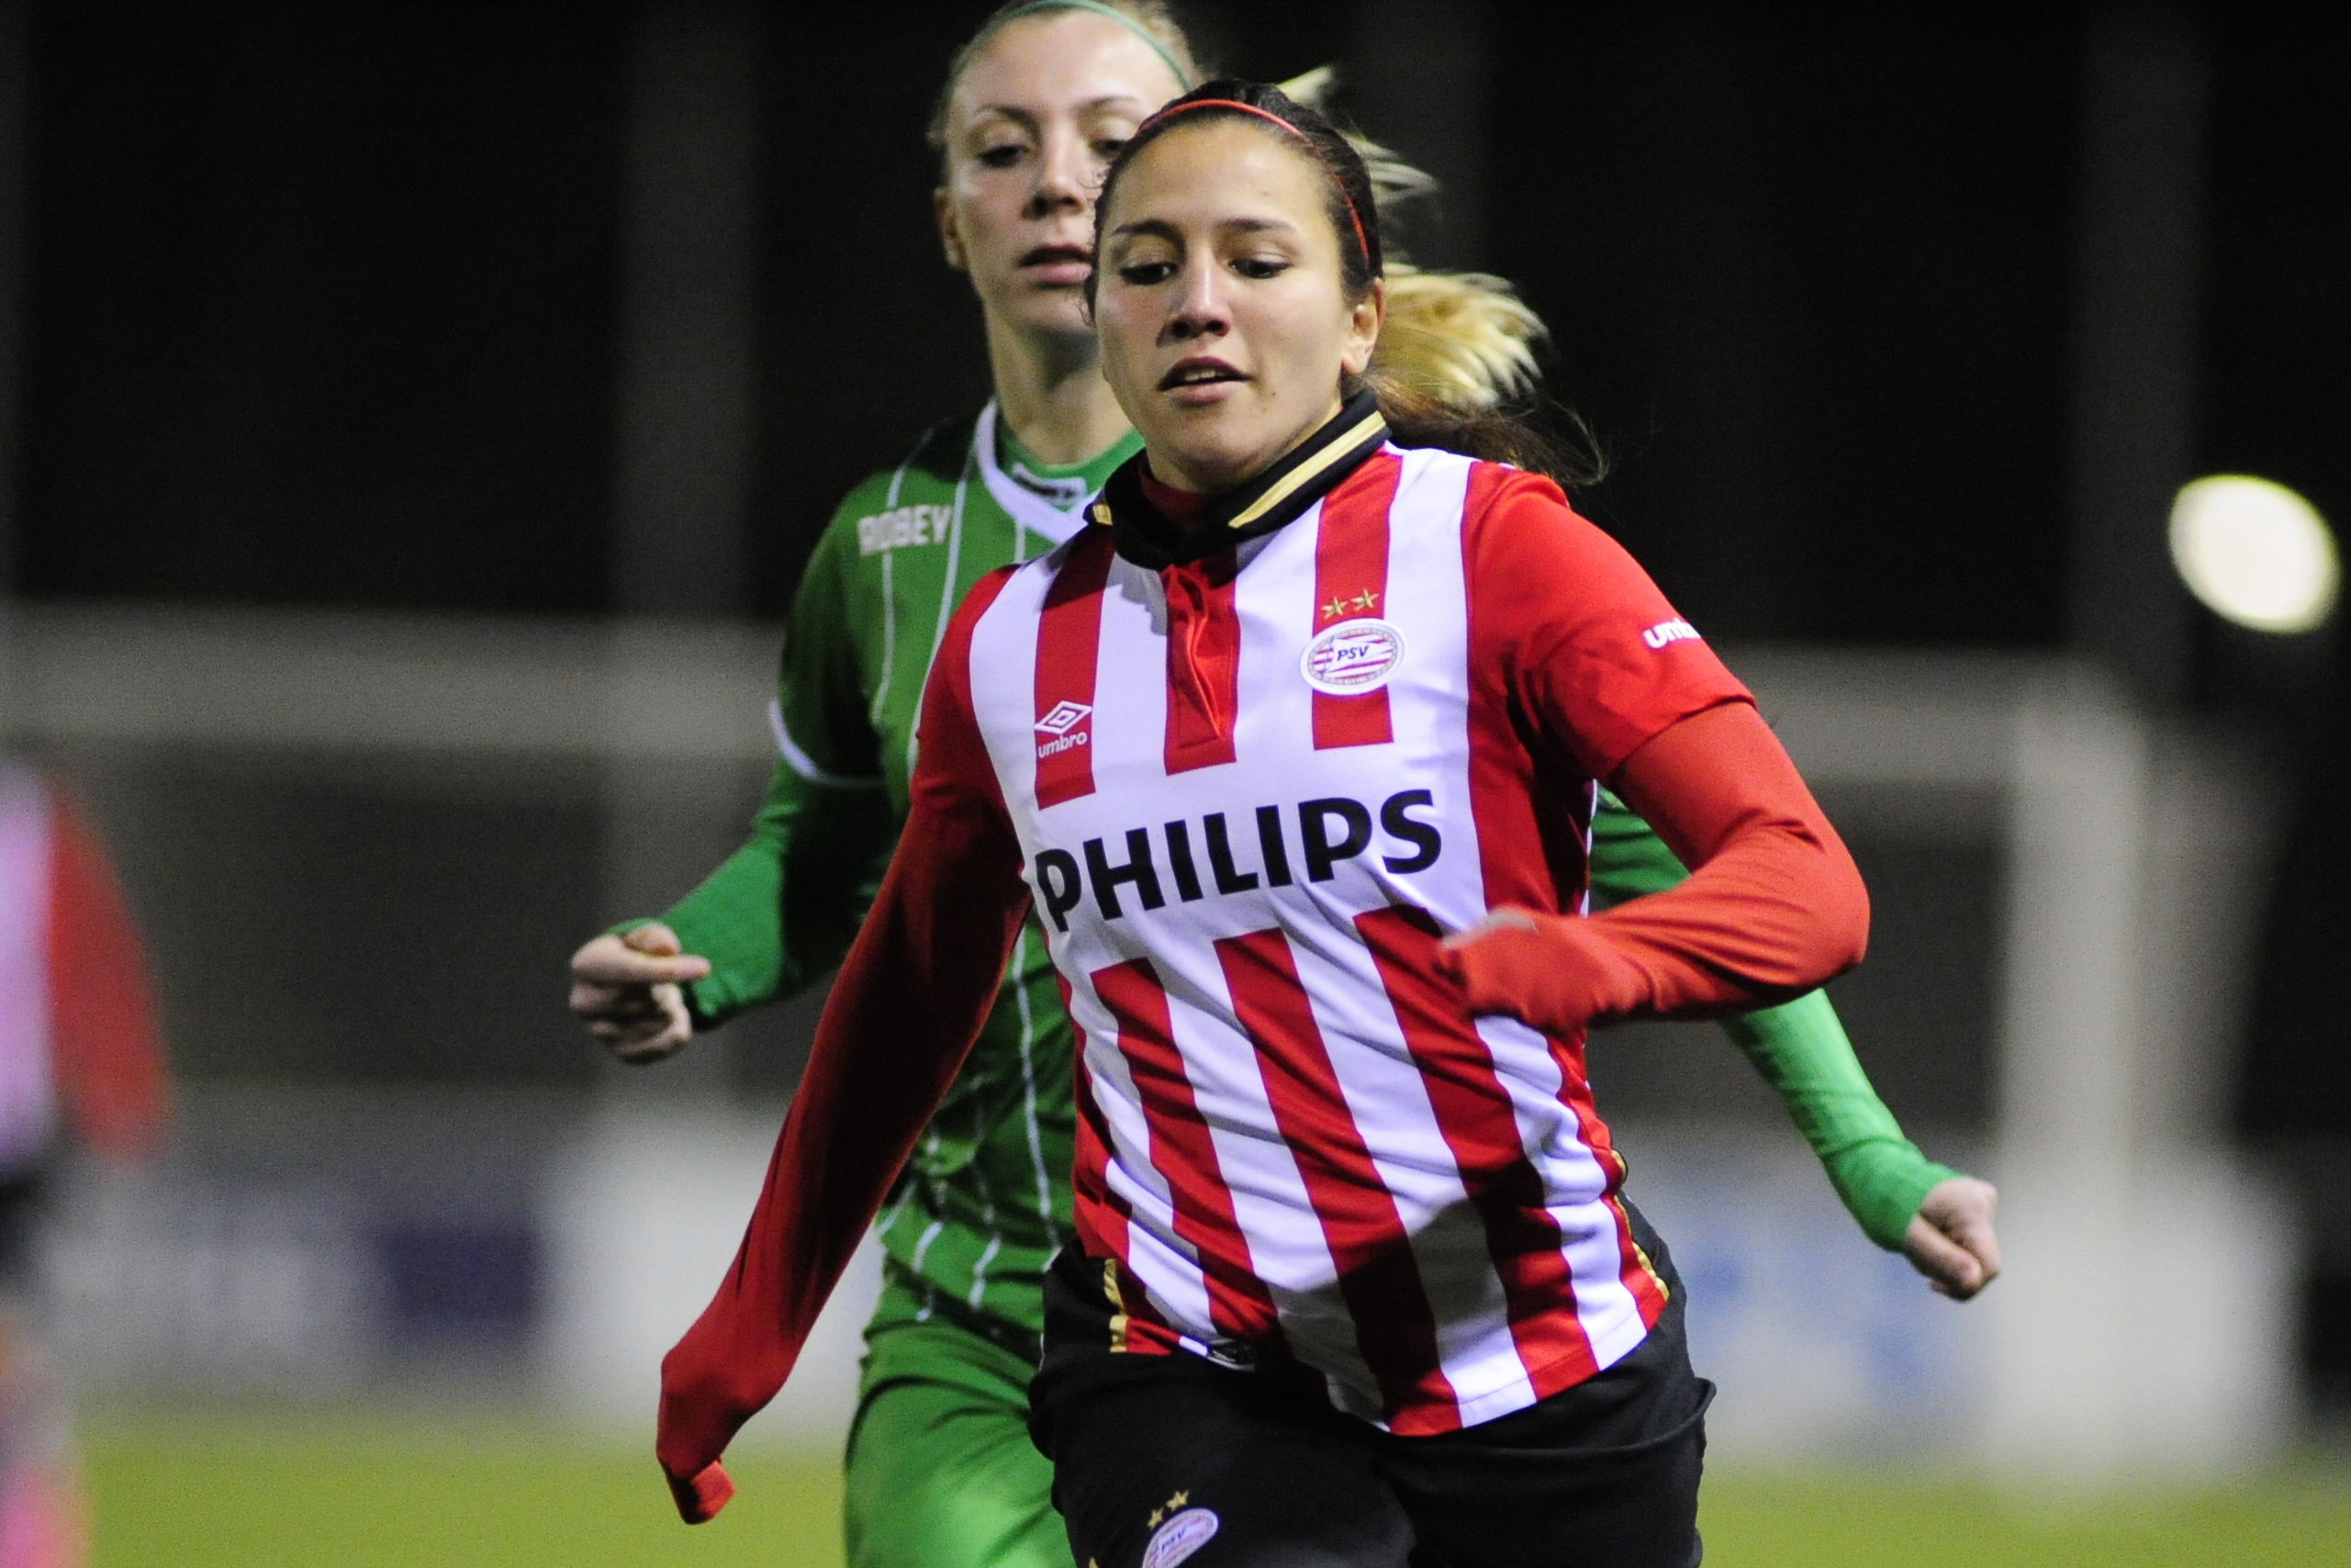 PSV – PEC Zwolle (5-2)